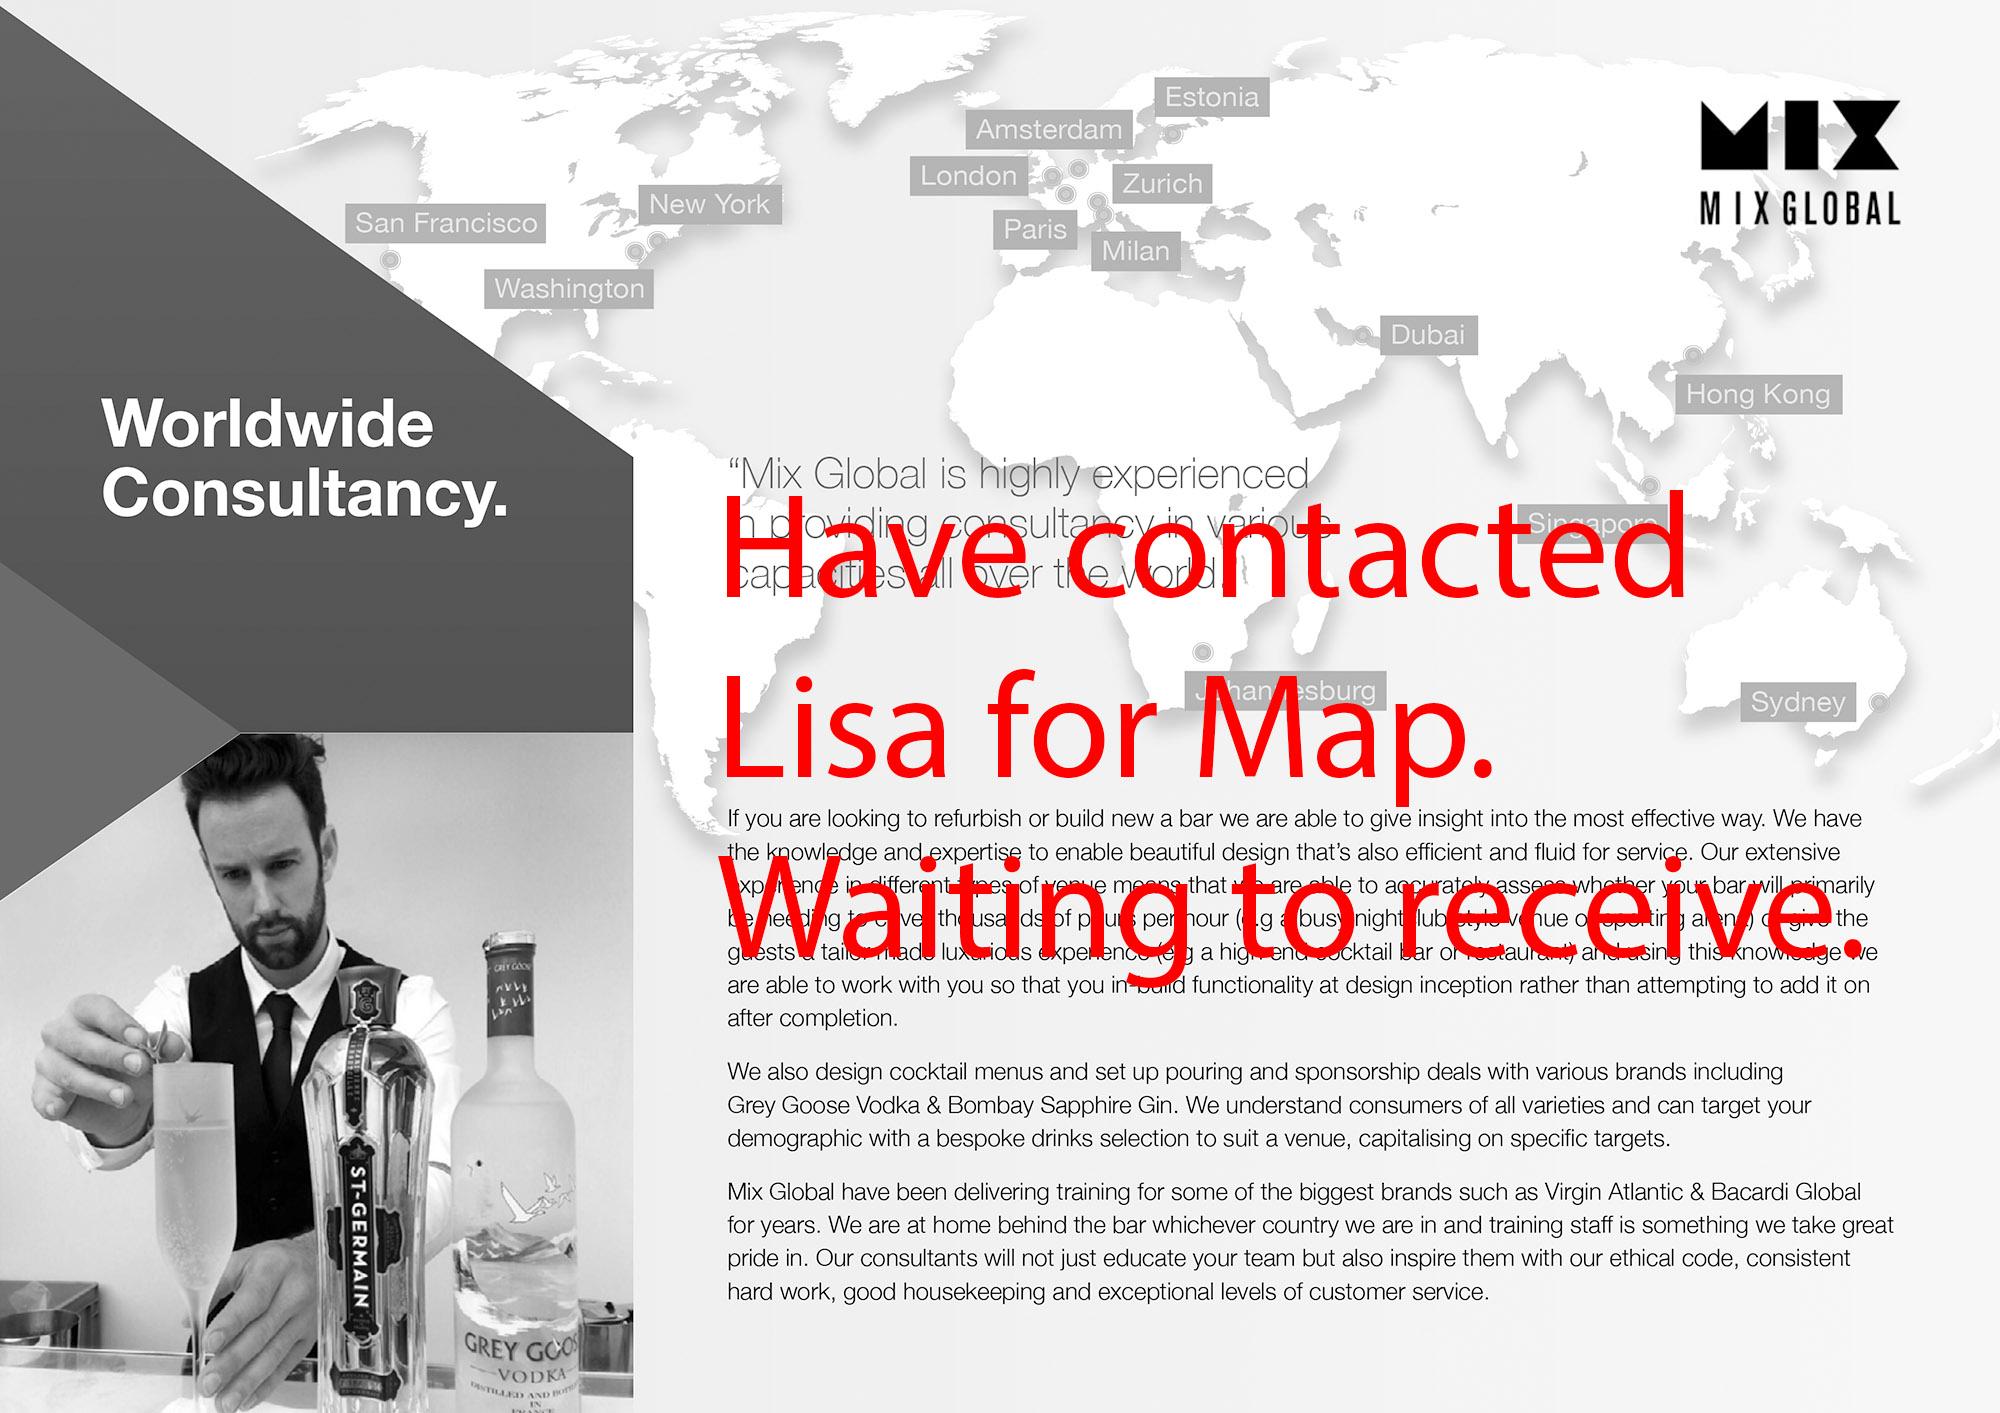 mapconconsultancy.jpg